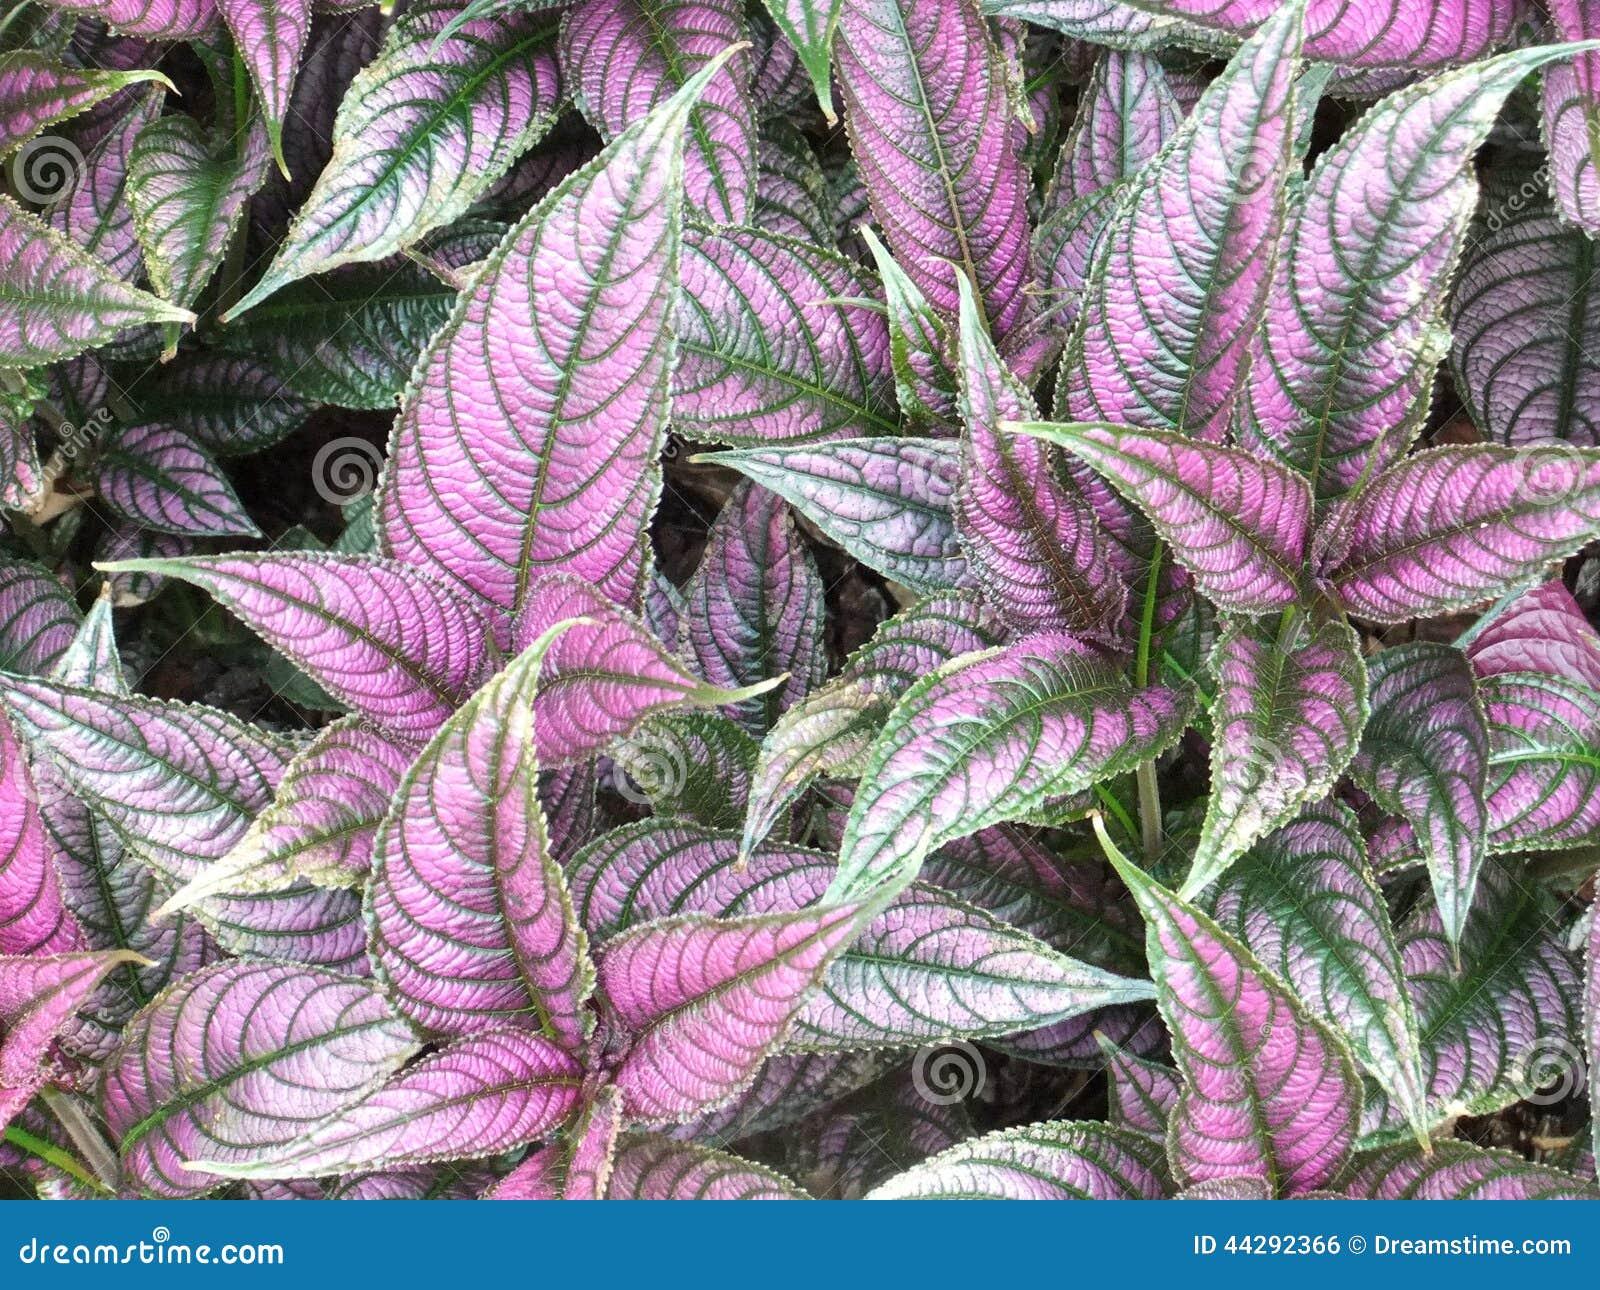 Plante pourpre et verte de jardin botanique photo stock for Plante verte de jardin